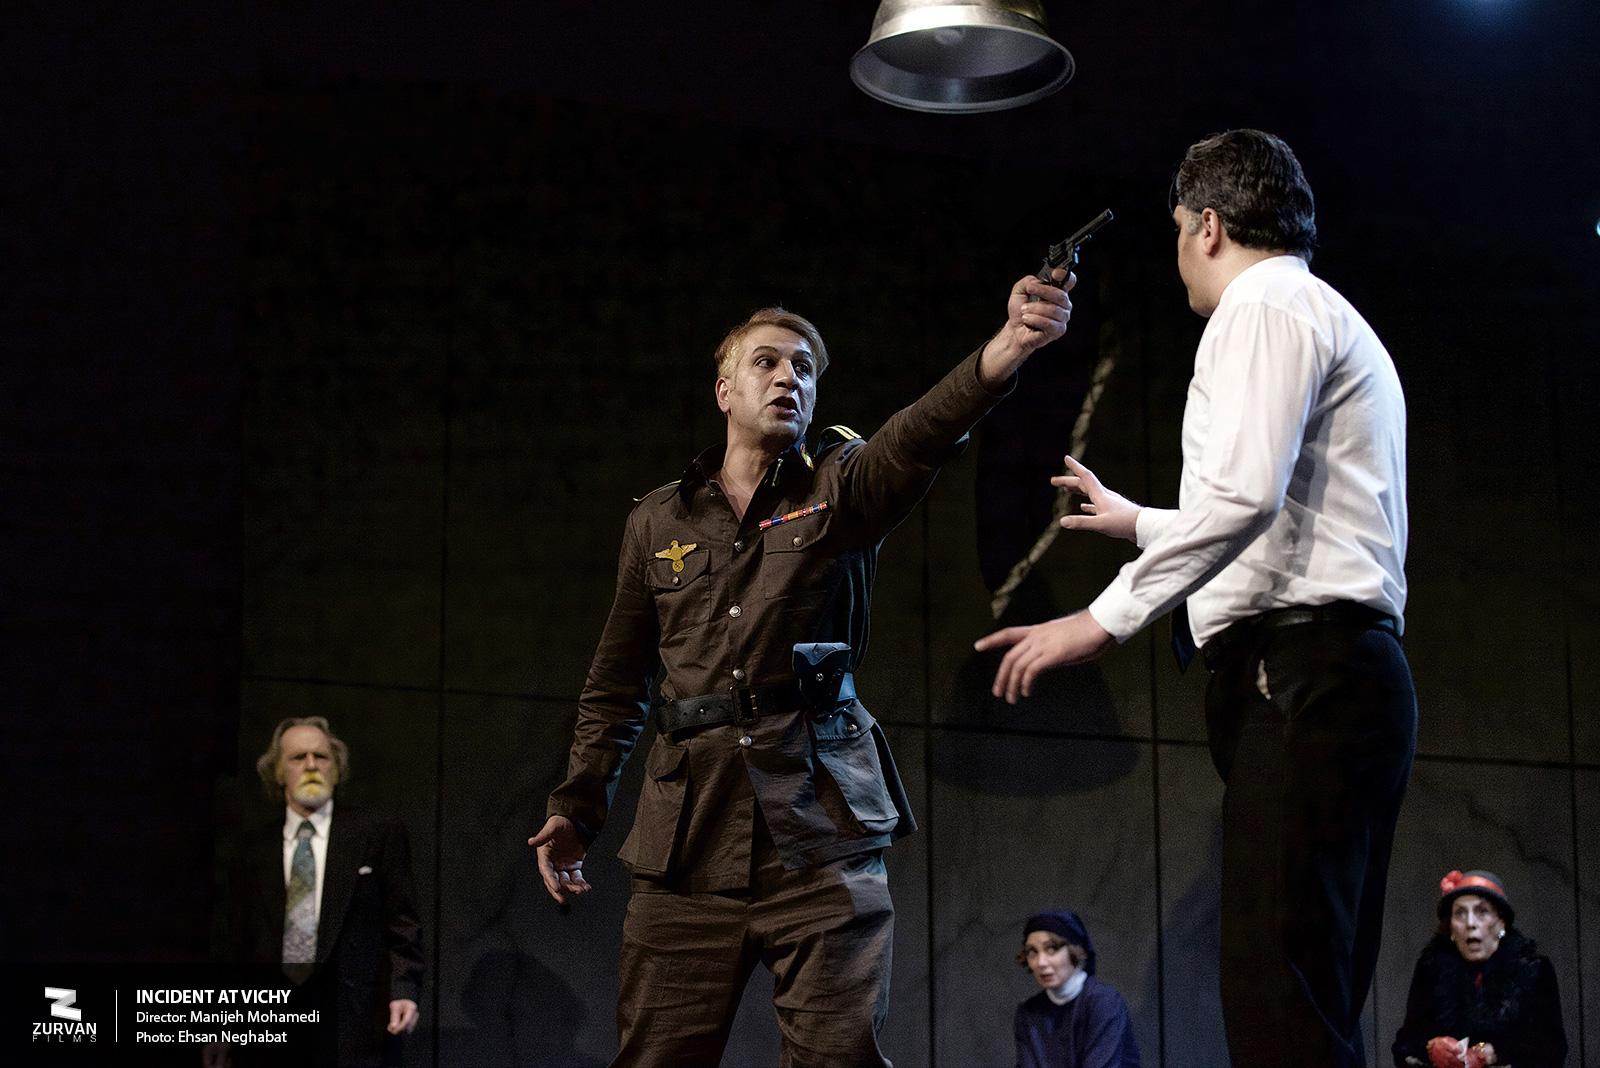 Incident at Vichy [Photo 8]